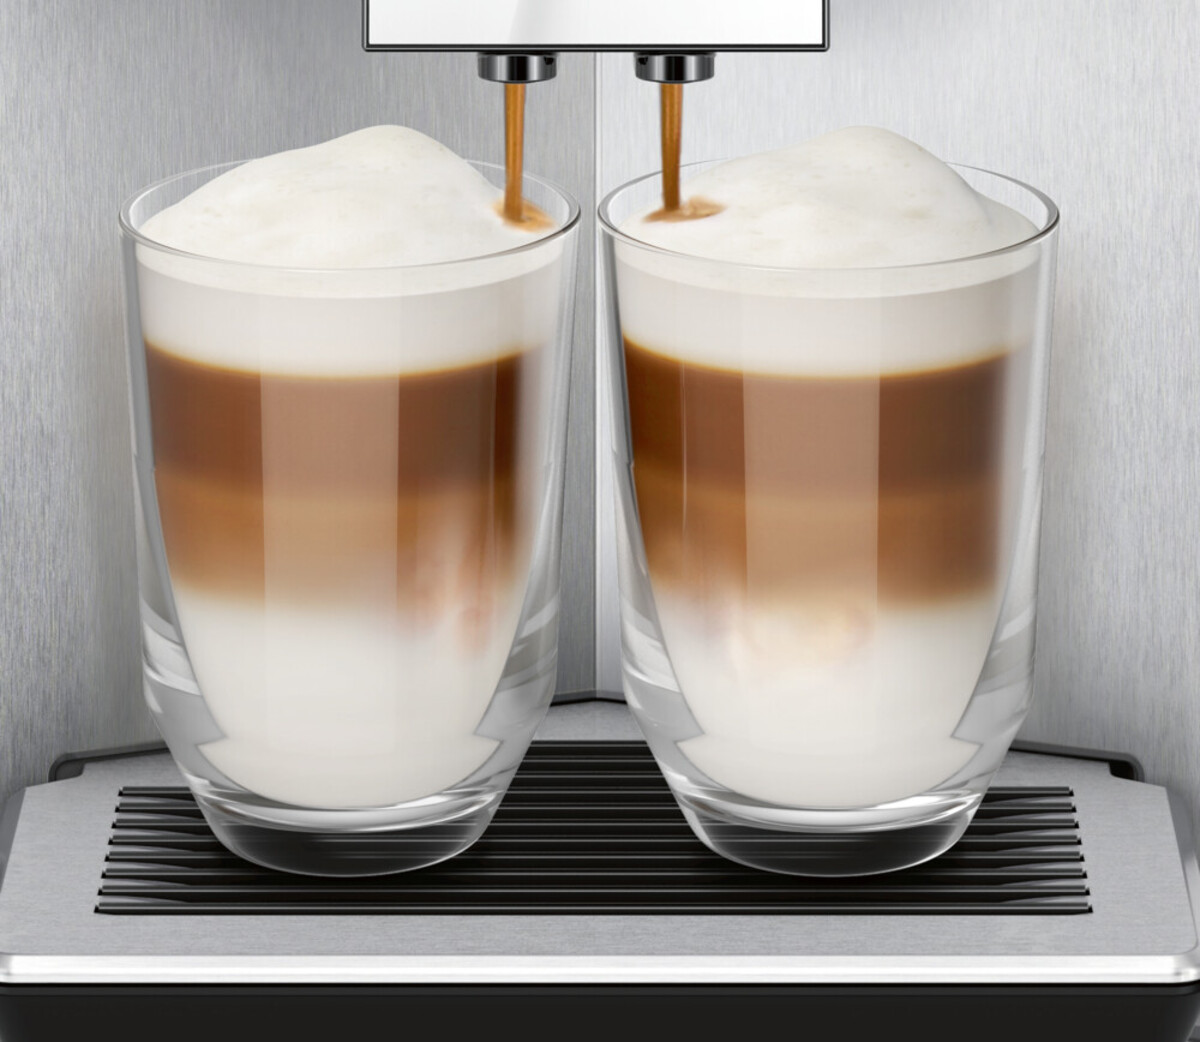 Bild 3 von SIEMENS EQ.9 plus connect s700 TI9578X1DE Edelstahl Kaffeevollautomat